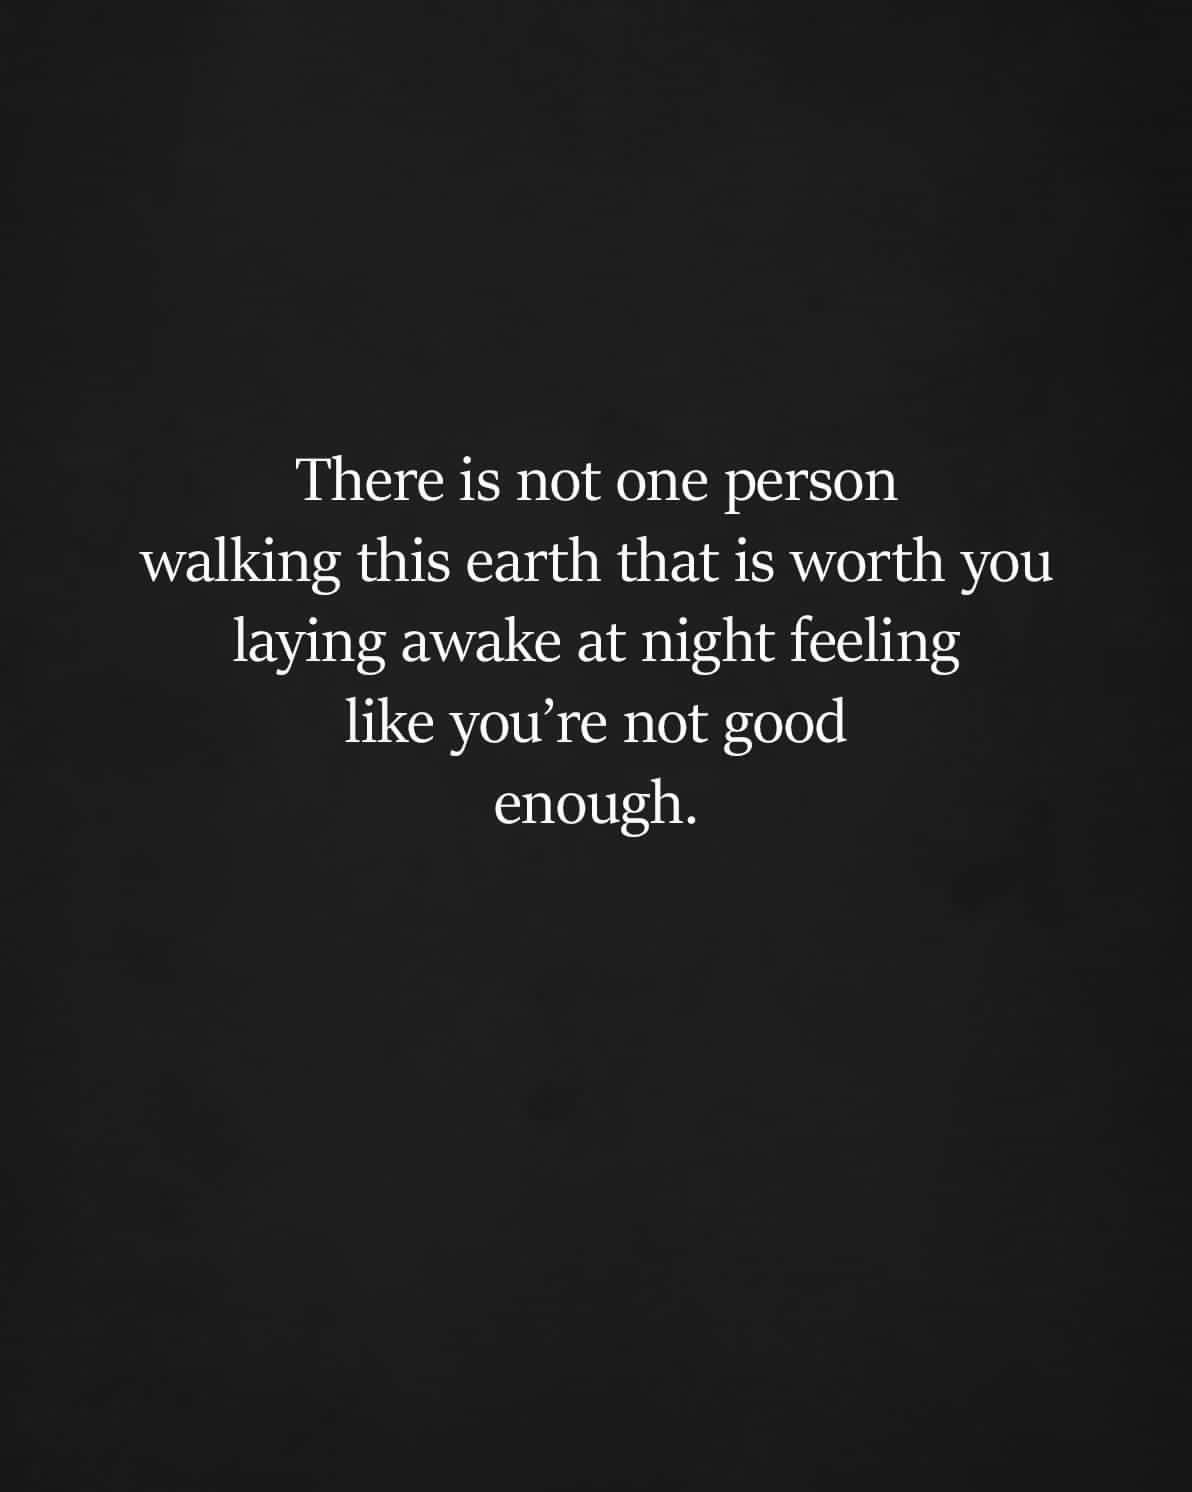 Do Not Lie Awake Not Good Enough Quotes You Deserve Quotes Deserve Quotes